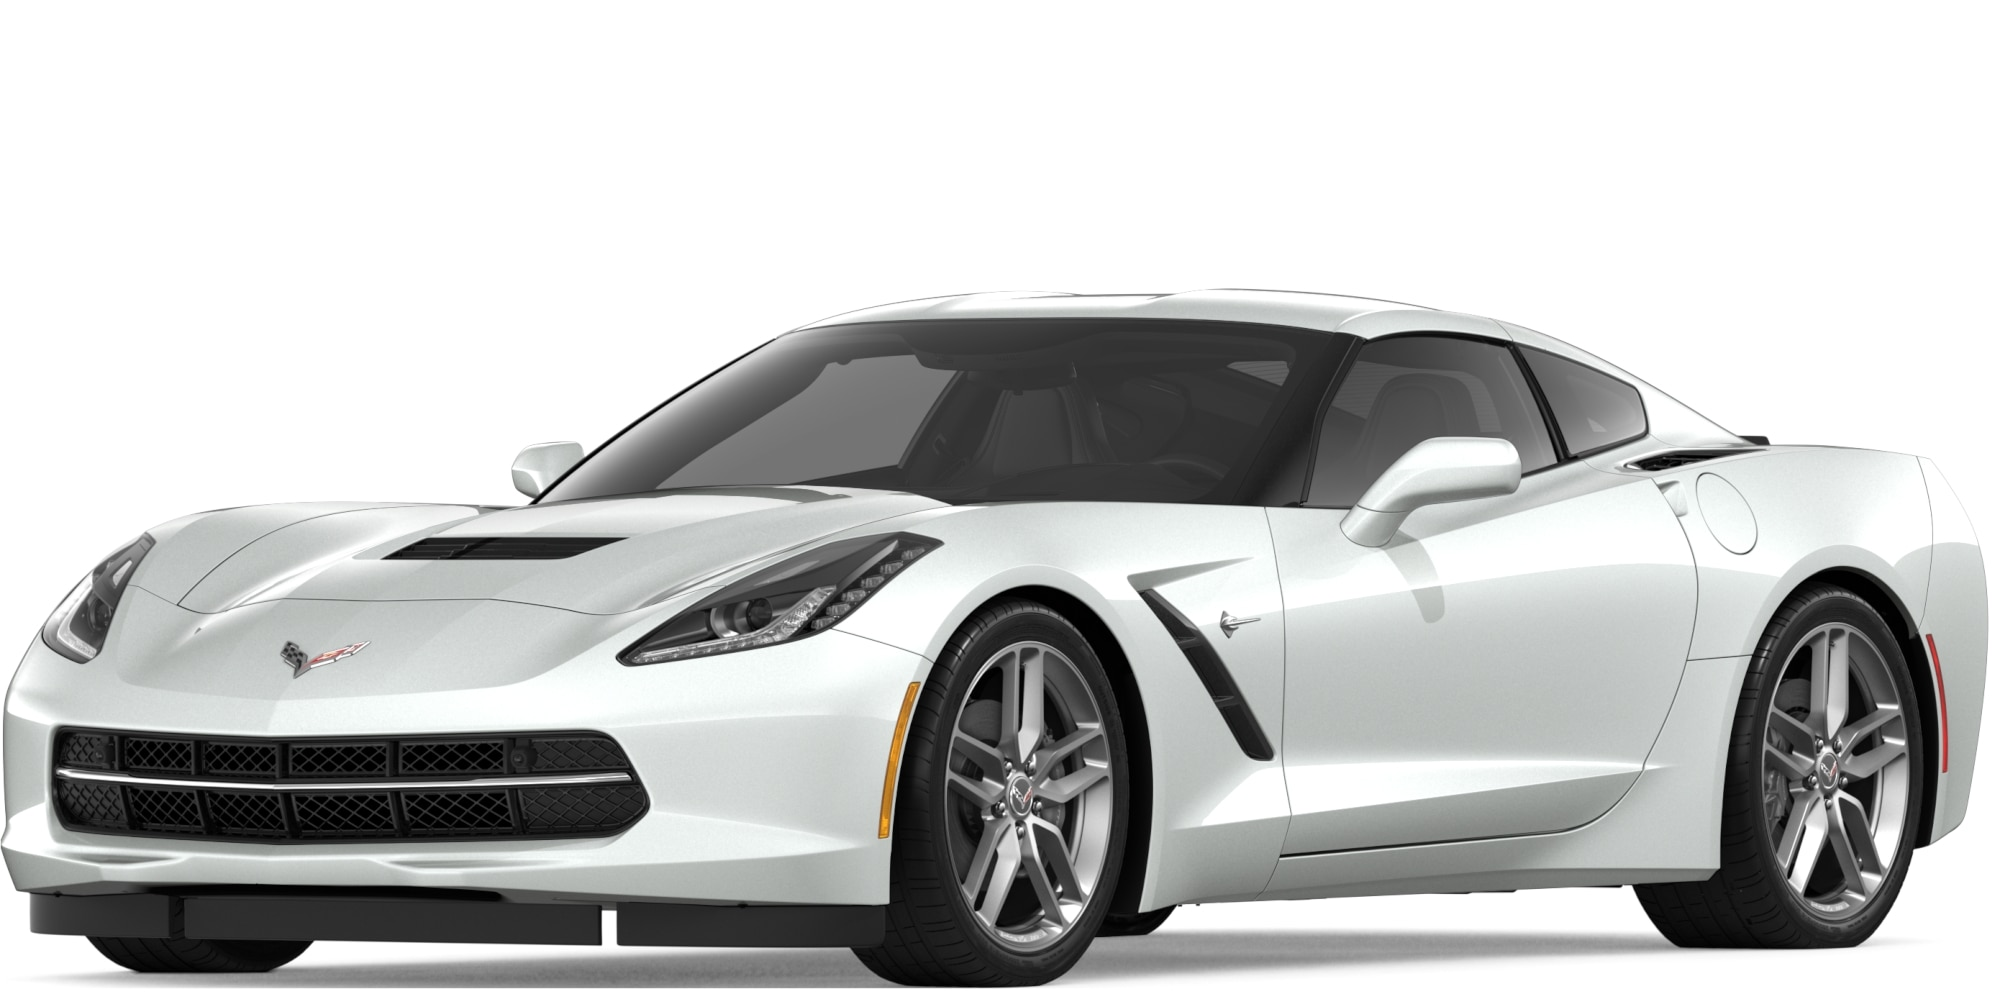 New Chevrolet Corvette Lease and Finance fers in Suffolk VA